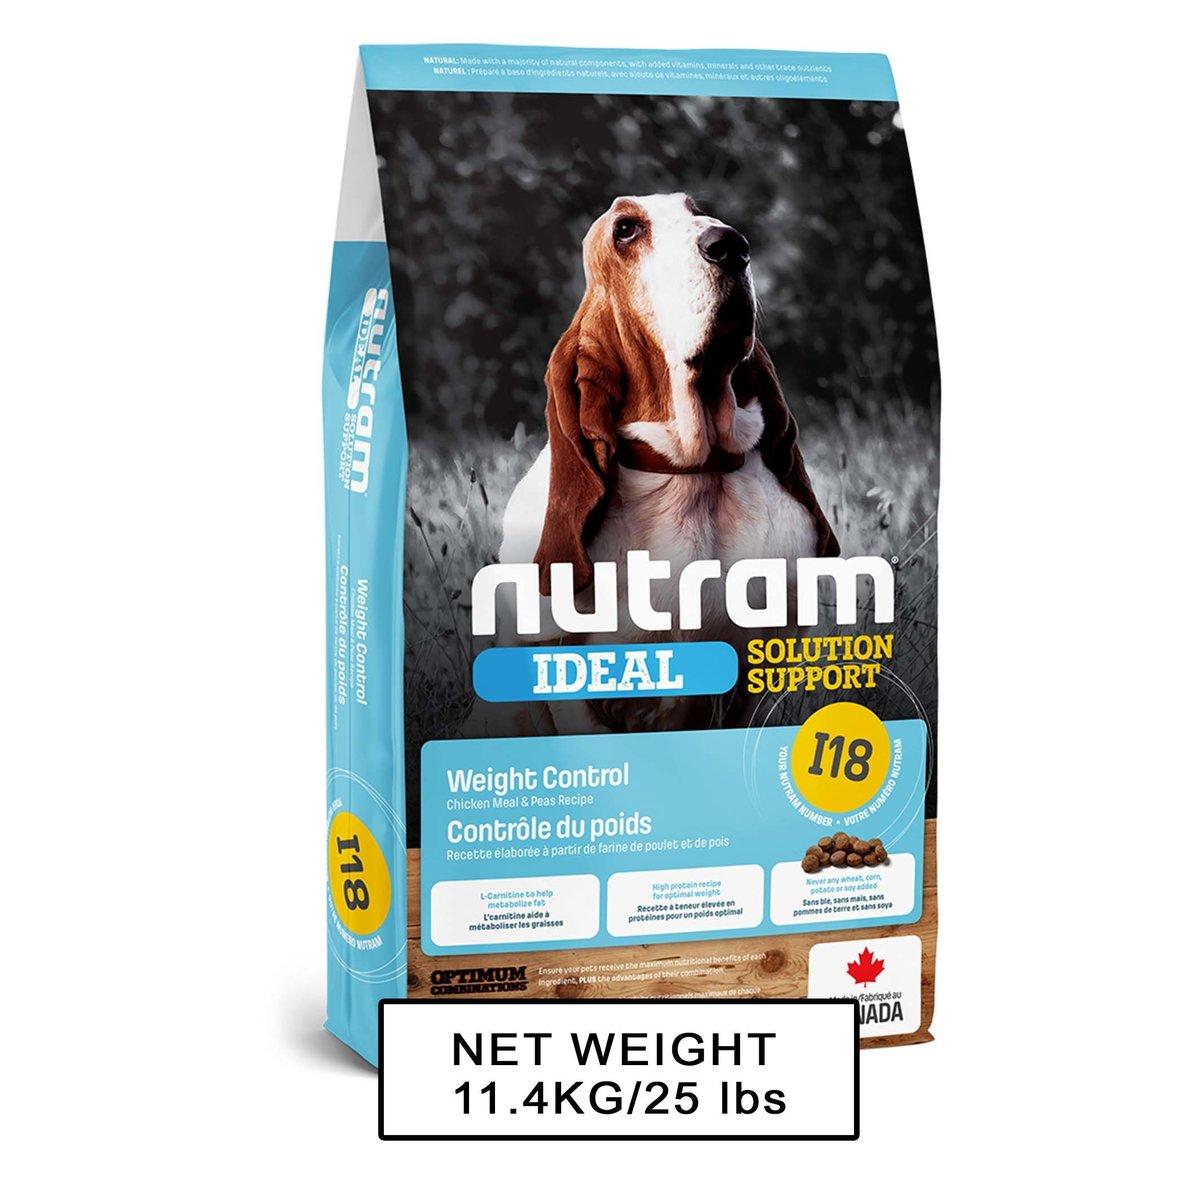 I18 Weight Control Dog Food 控制體重狗糧 11.4kg